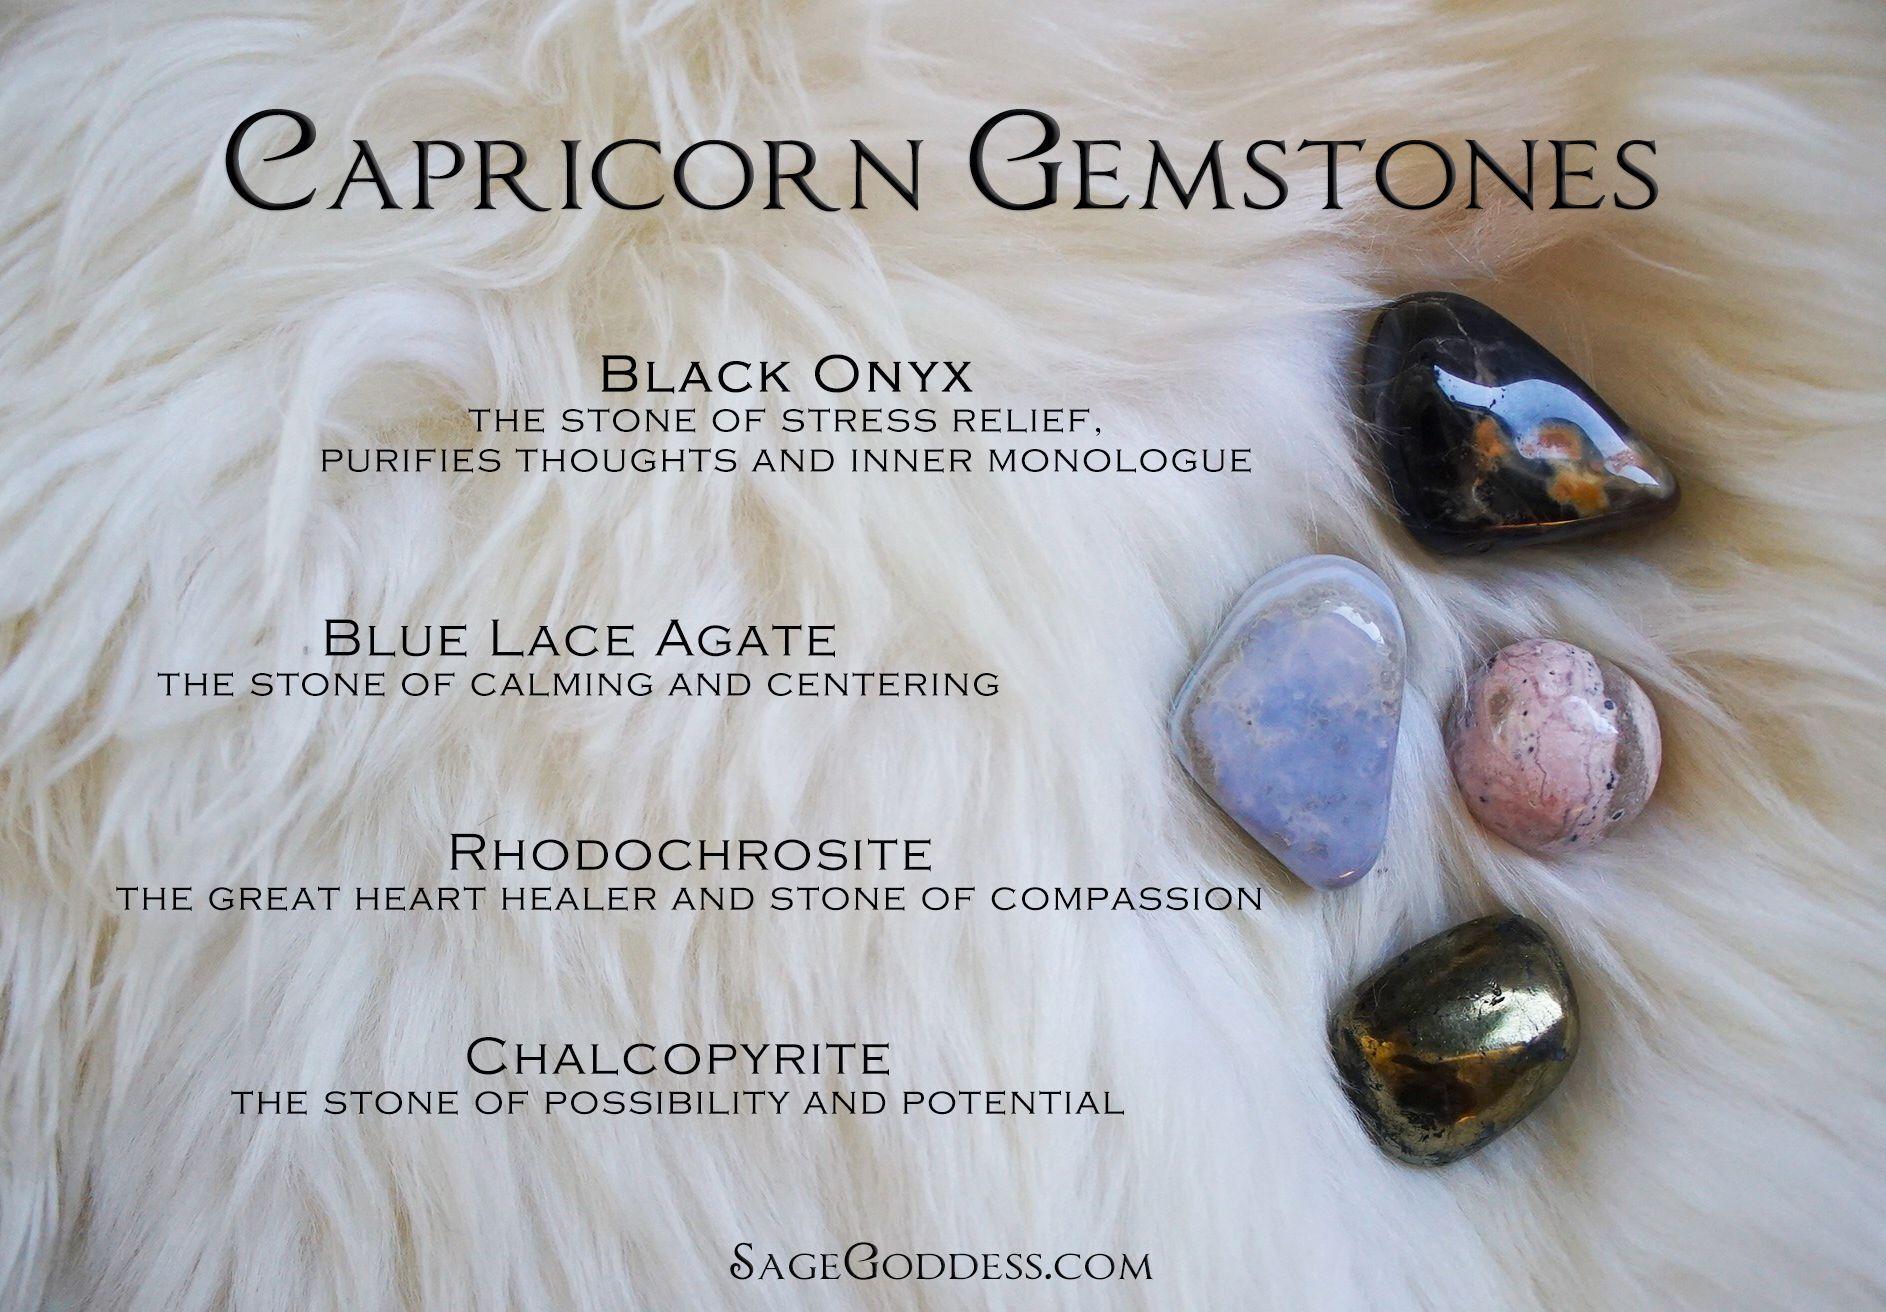 Capricorn Gemstones Capricorn, Zodiac capricorn